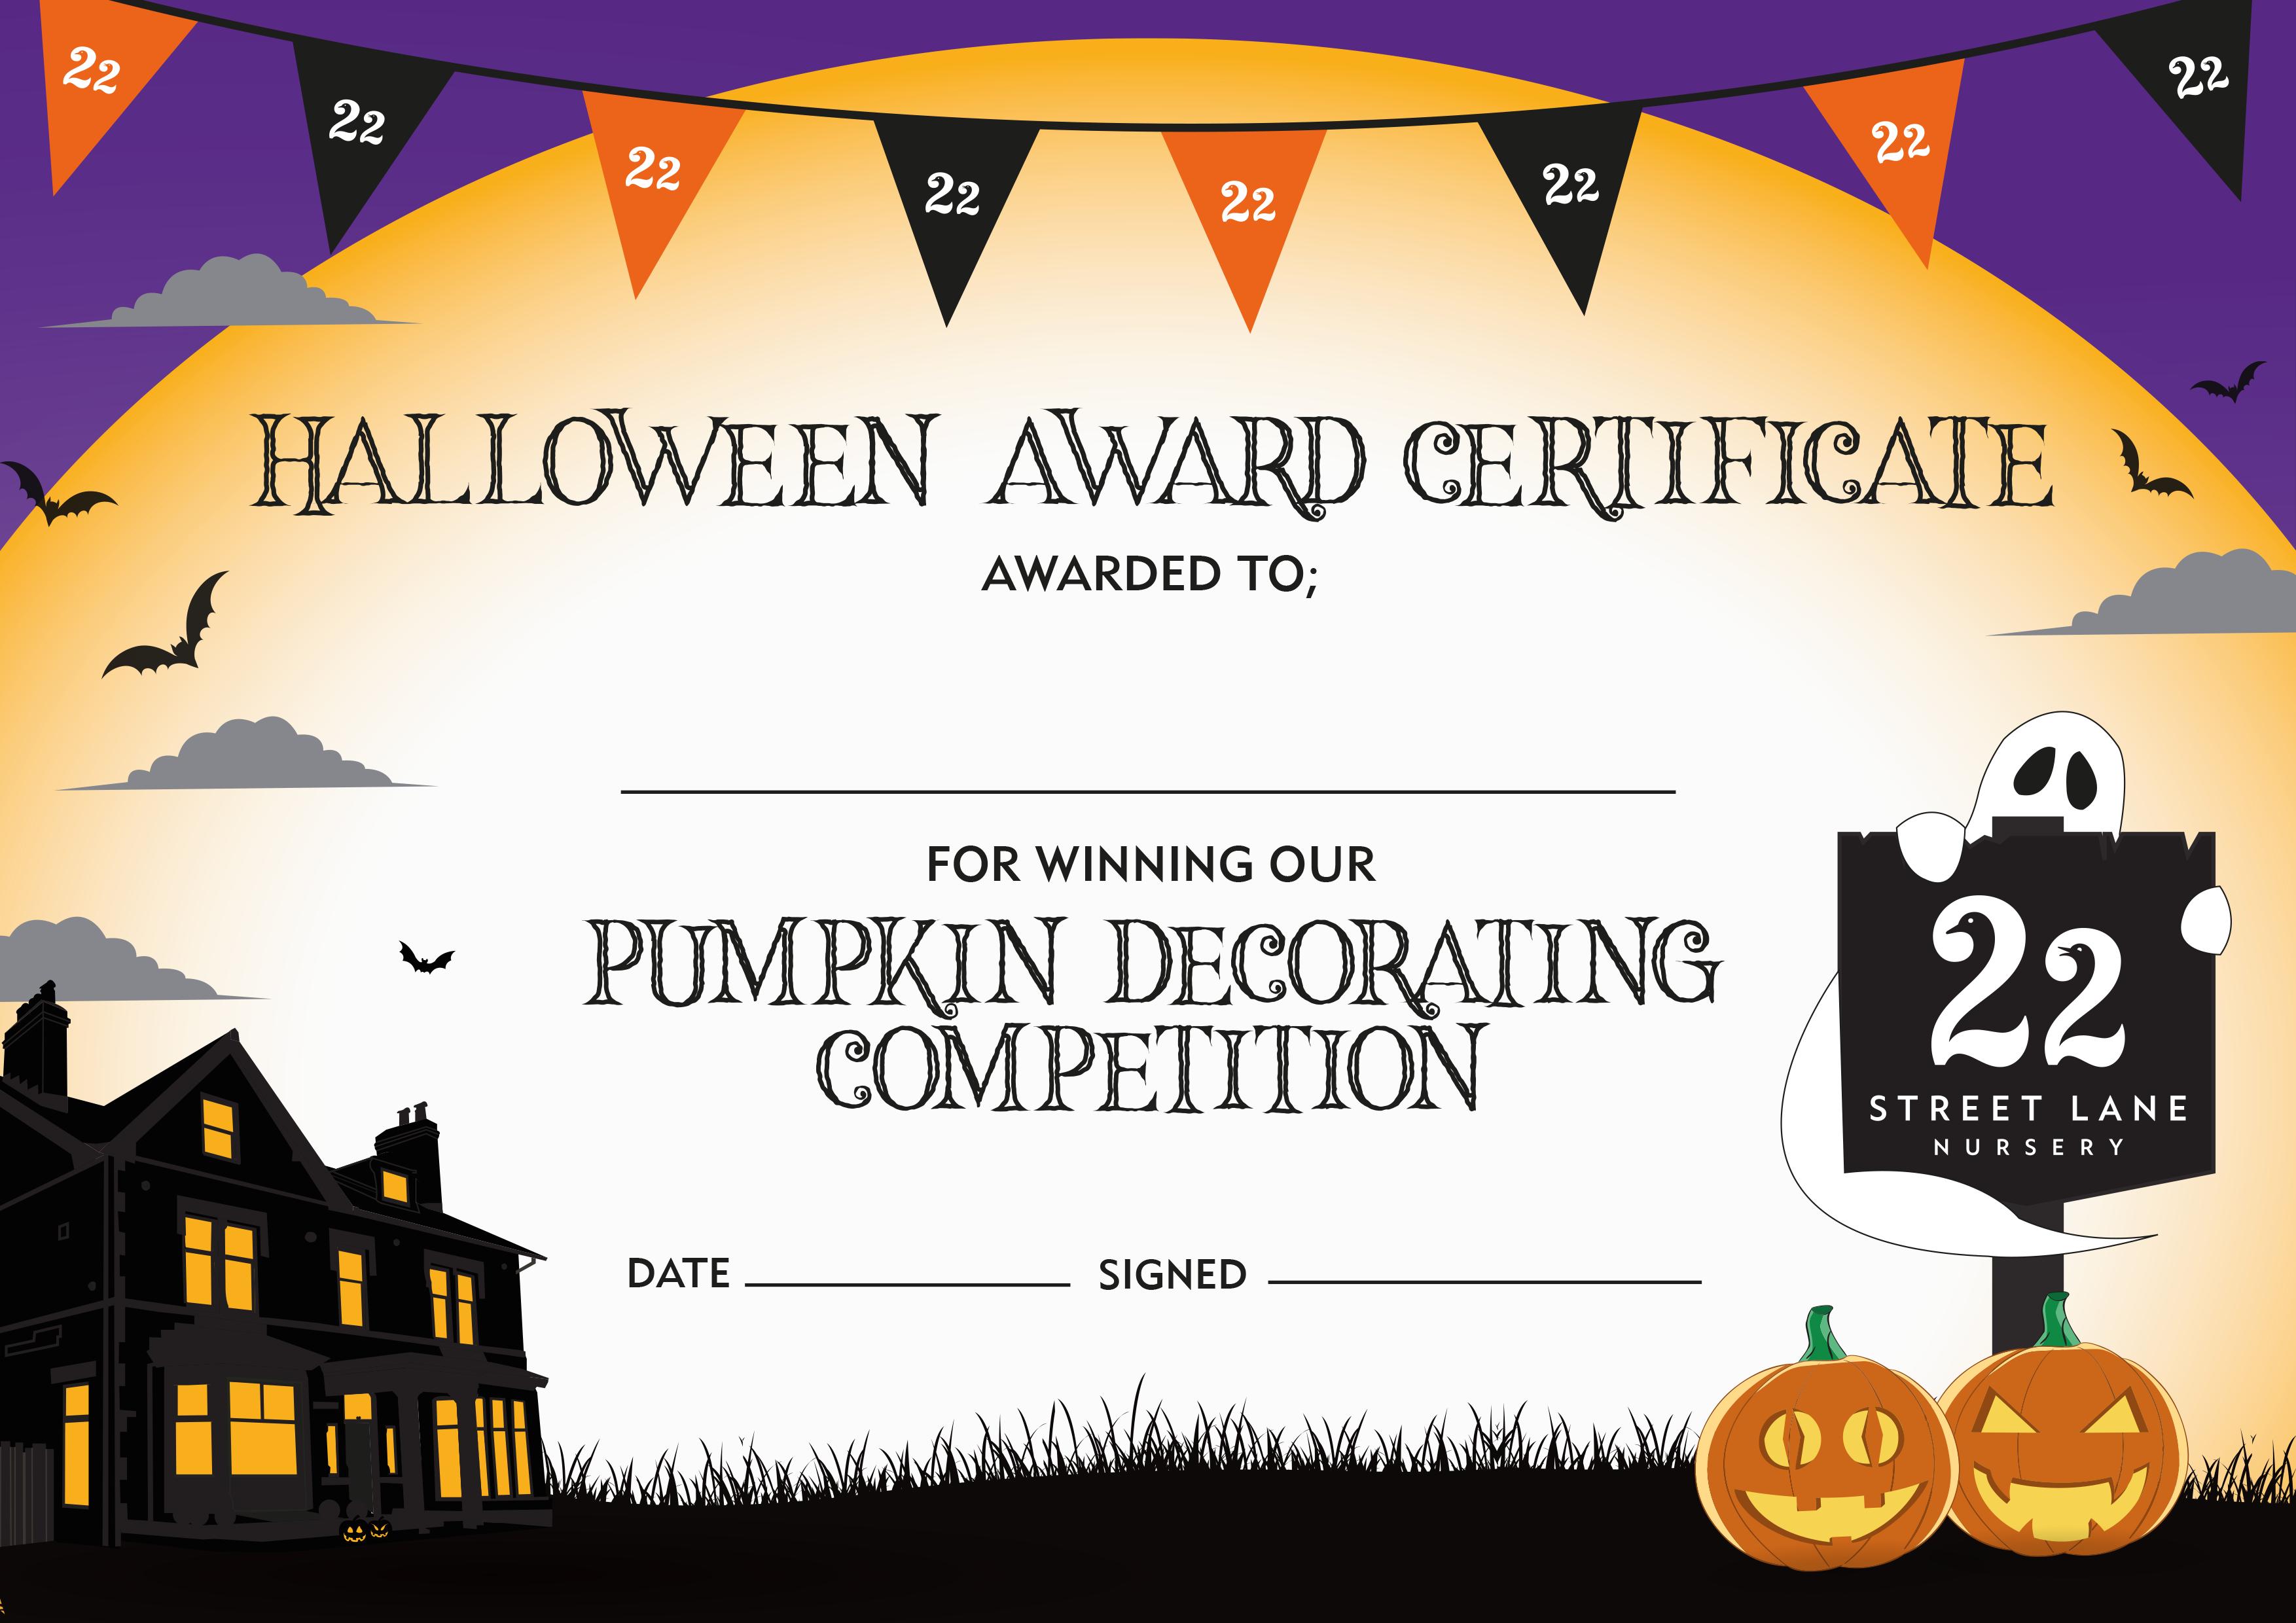 Halloween Award Certificate Pumpkin Decorating Competition Pumpkin Halloween Decorations Pumpkin Decorating Pumpkin Decorating Contest